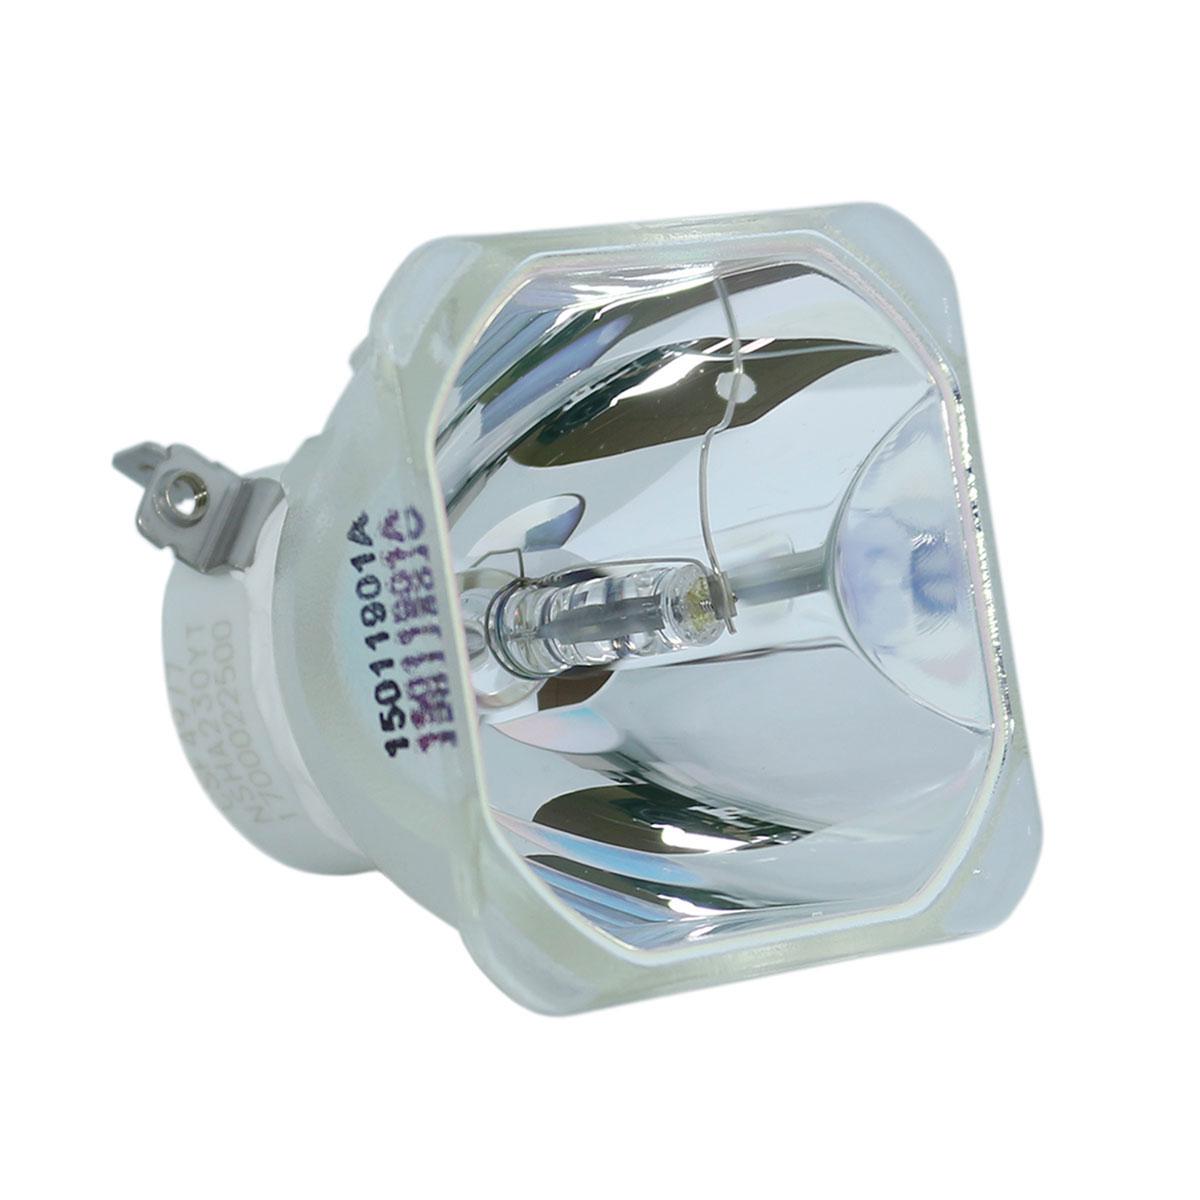 Compatible Bare Bulb NP33LP NP-33LP for NEC NP-UM352W NP-UM361X NP-UM361X-WK Projector Lamp Bulb without housing монитор nec 30 multisync pa302w sv2 pa302w sv2